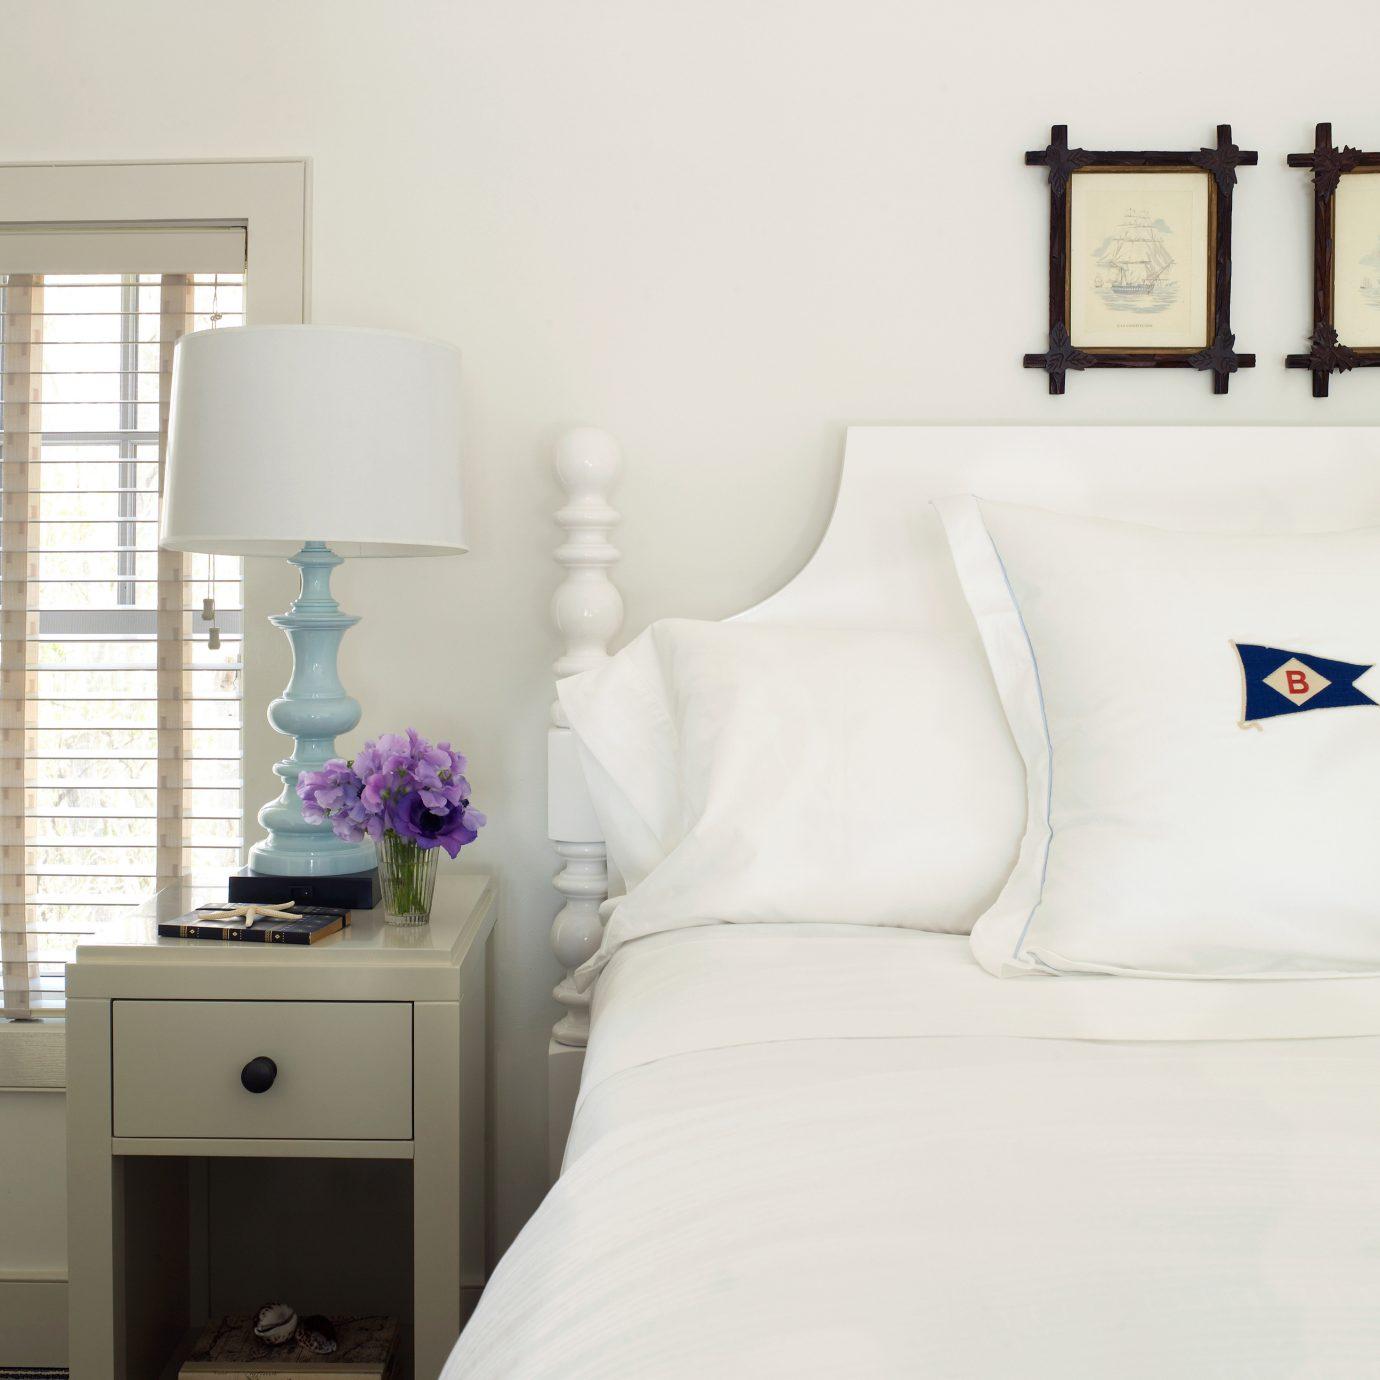 Bedroom Boutique Classic Suite Trip Ideas white pillow duvet cover product bed sheet bed frame textile bedclothes